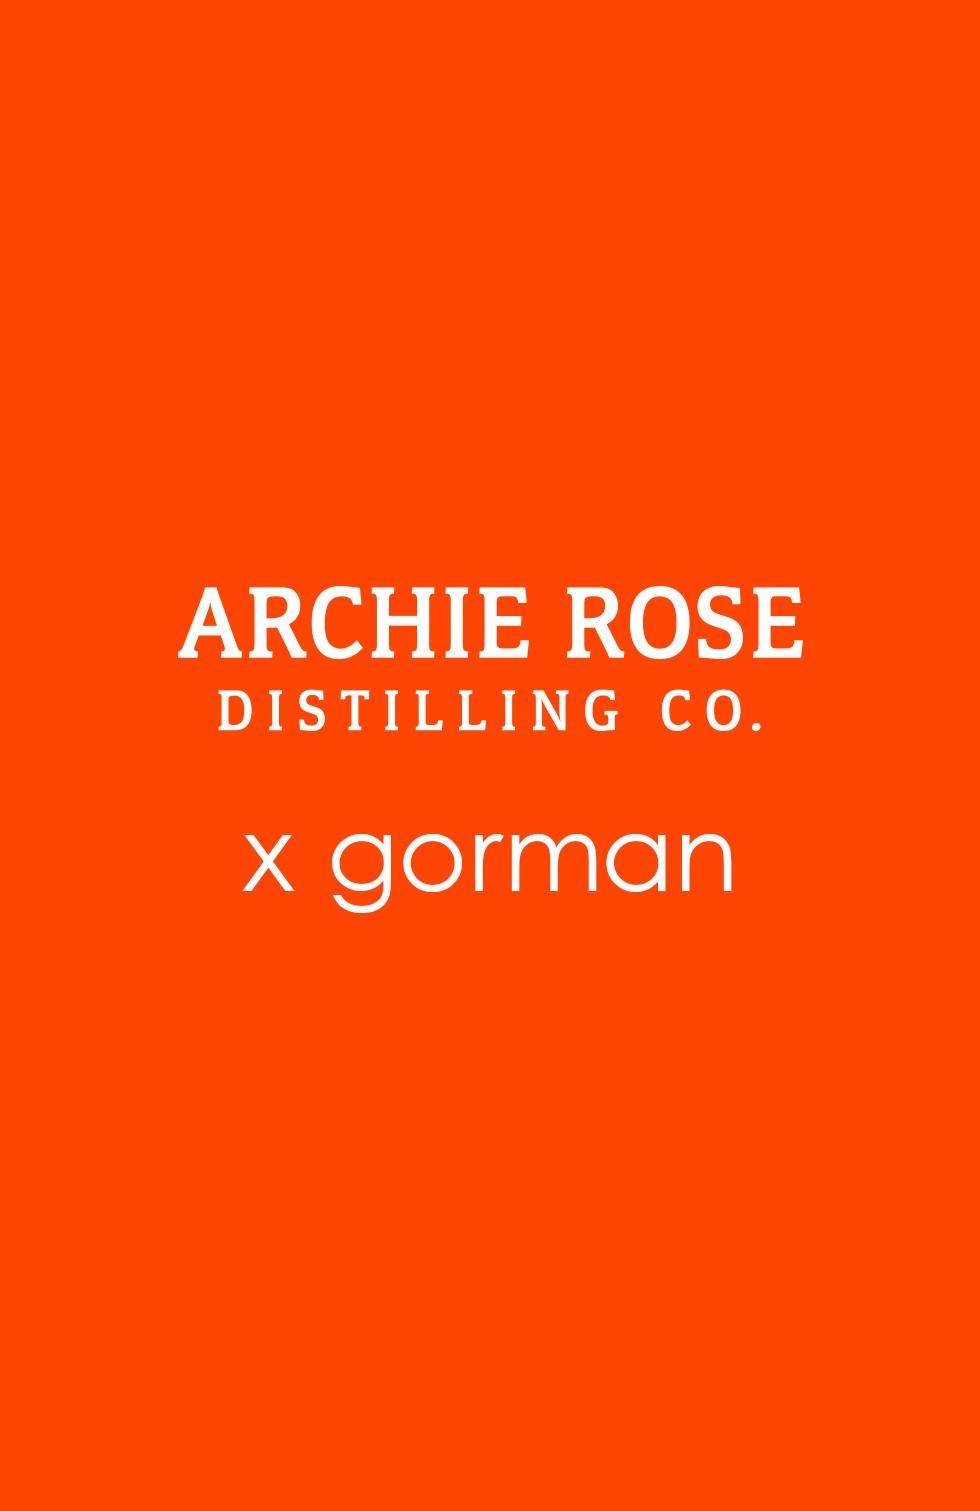 Archie Rose x gorman